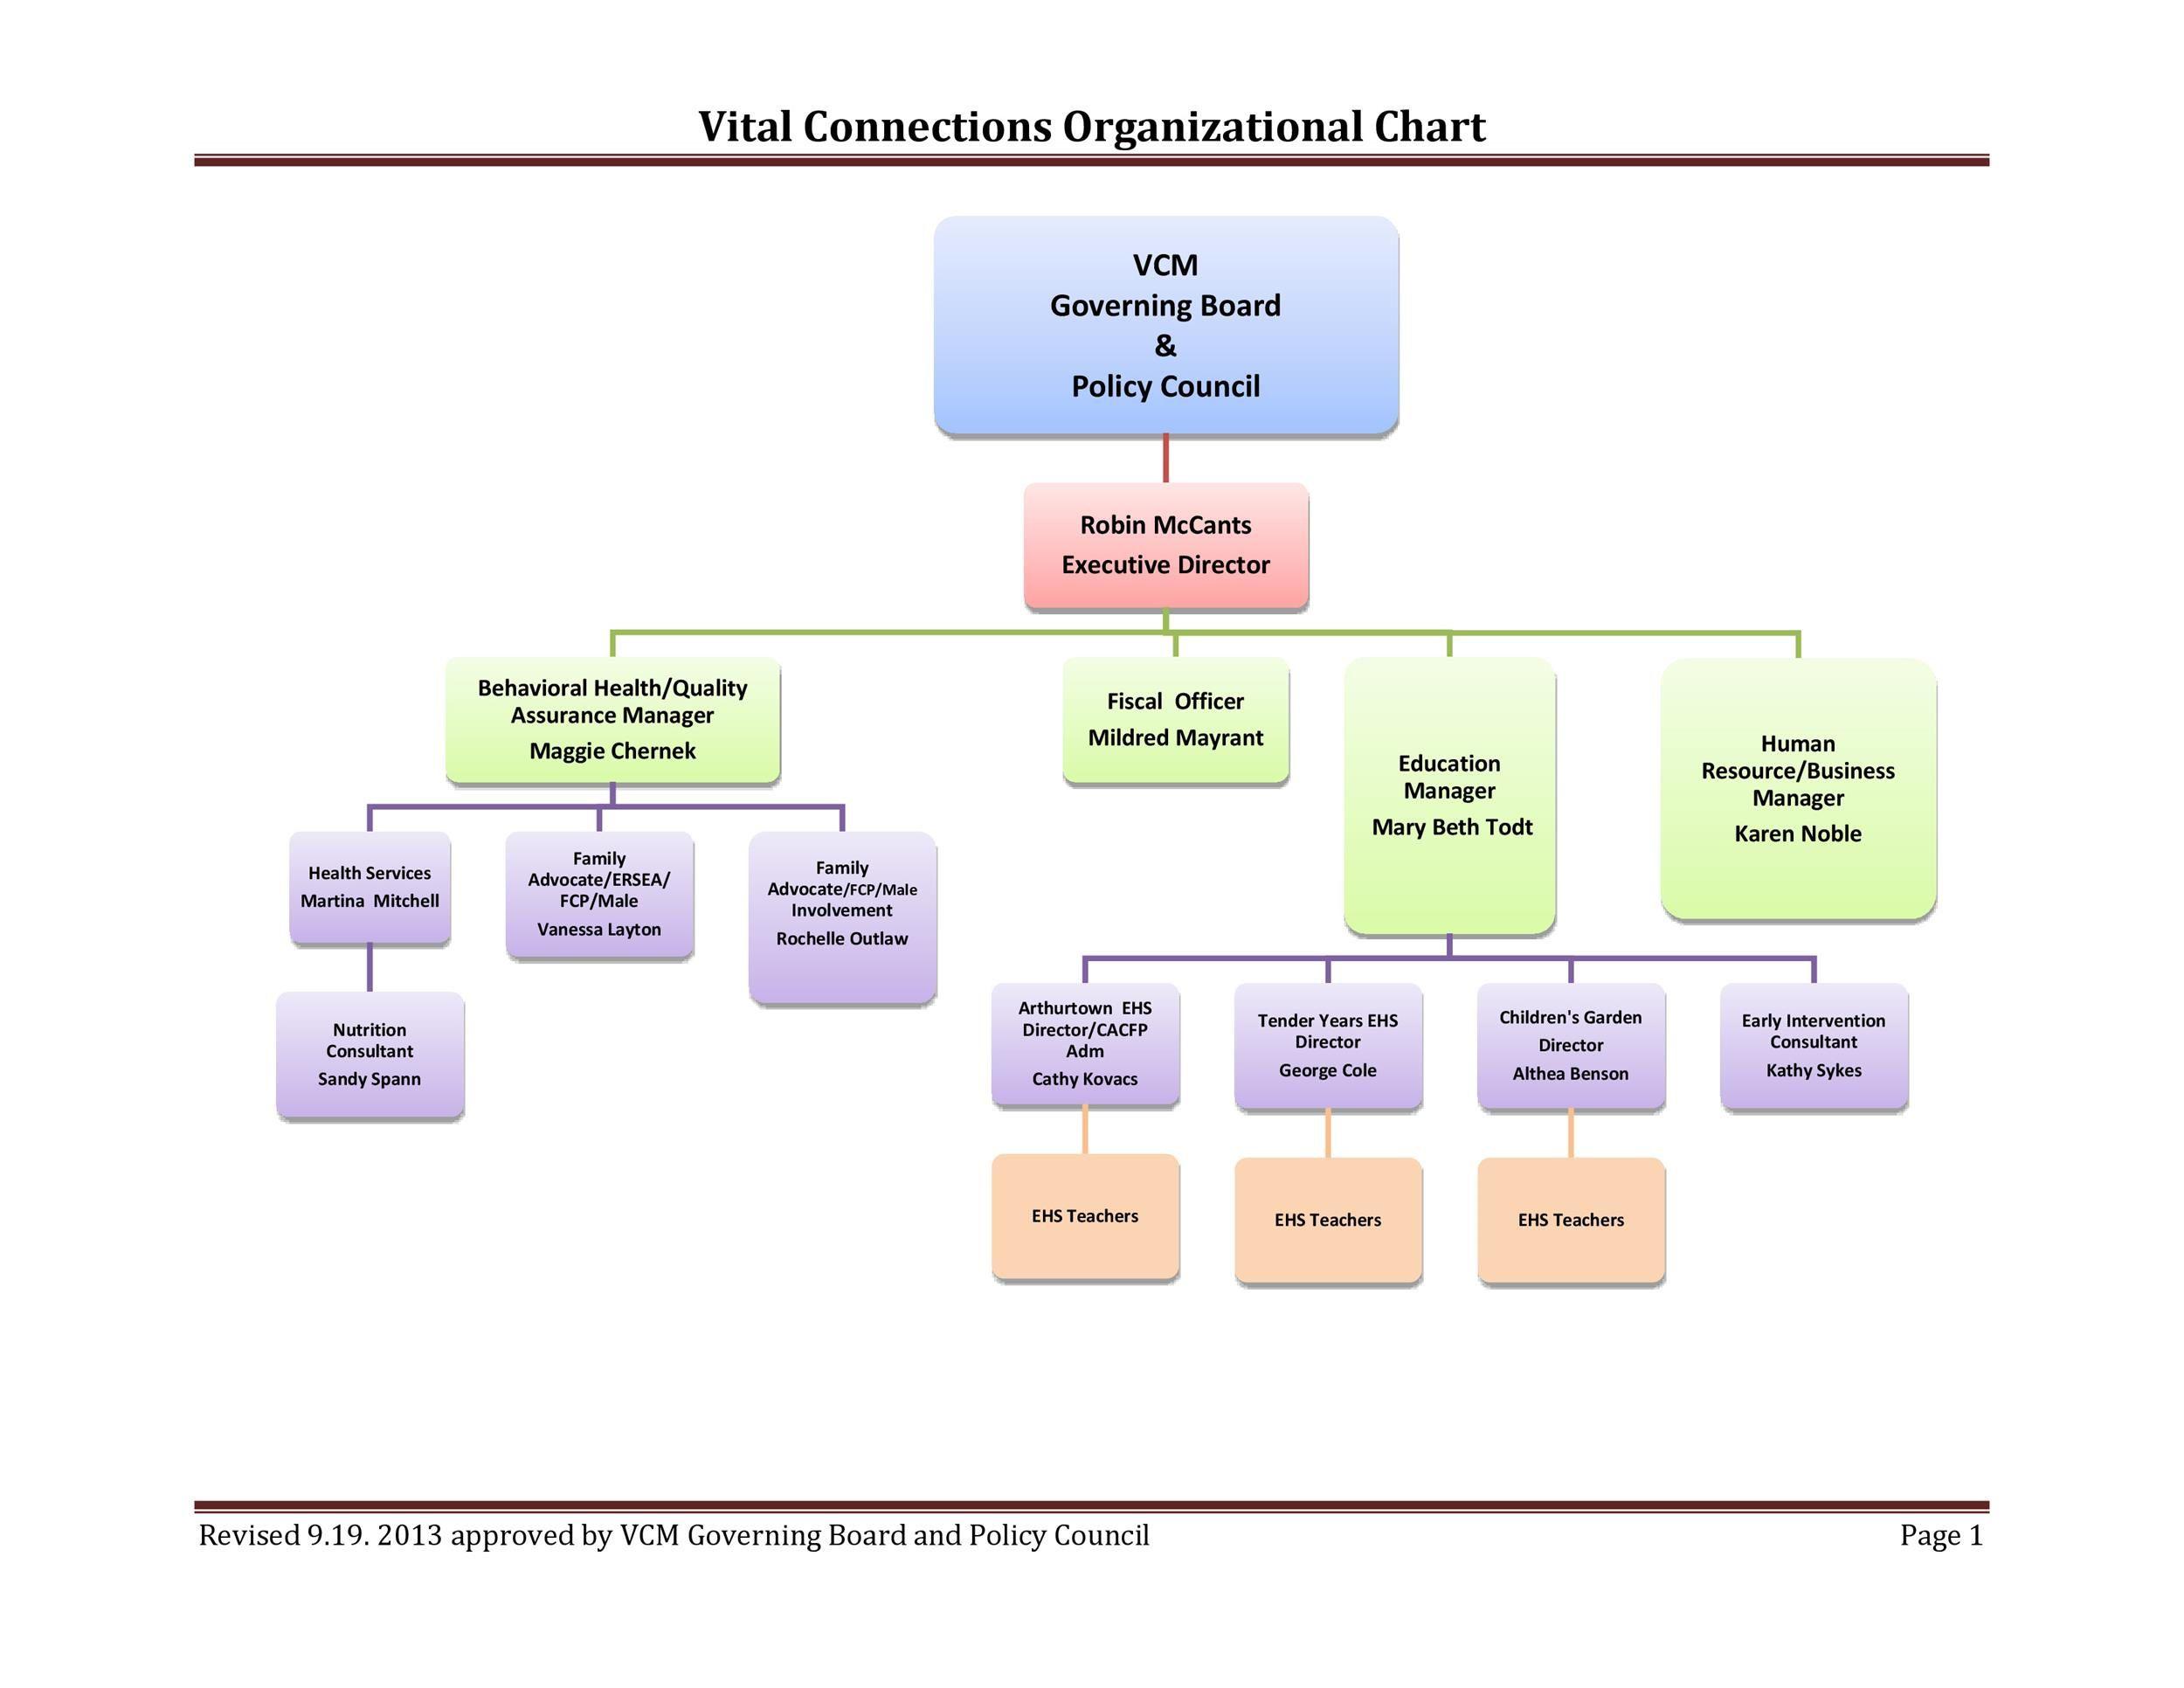 006 Wondrou M Word Org Chart Template Picture  Organizational Free DownloadFull